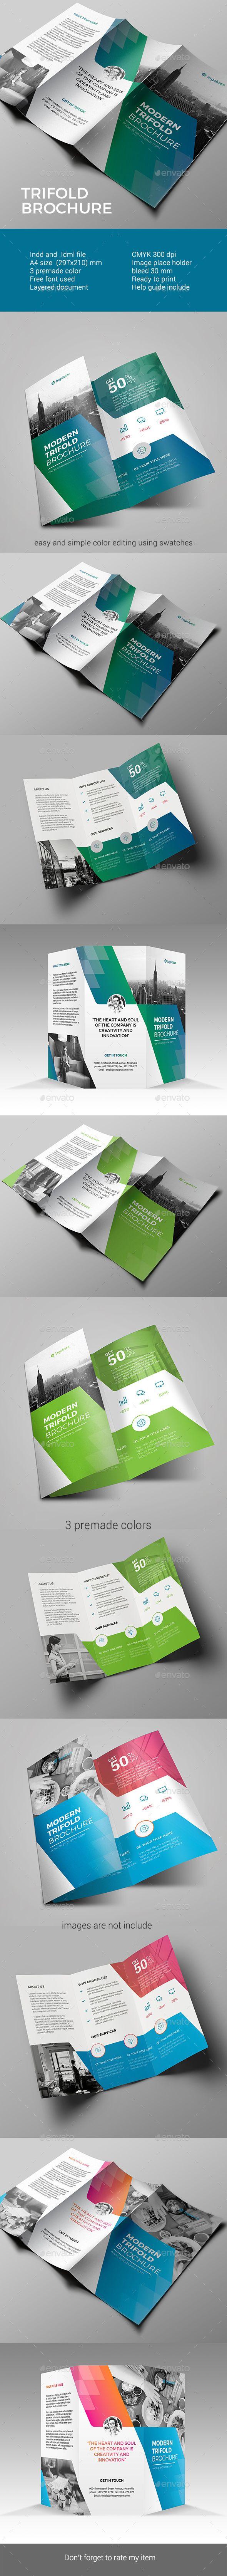 Trifold Brochure - Corporate Brochures Download here : https://graphicriver.net/item/trifold-brochure/19455096?s_rank=68&ref=Al-fatih